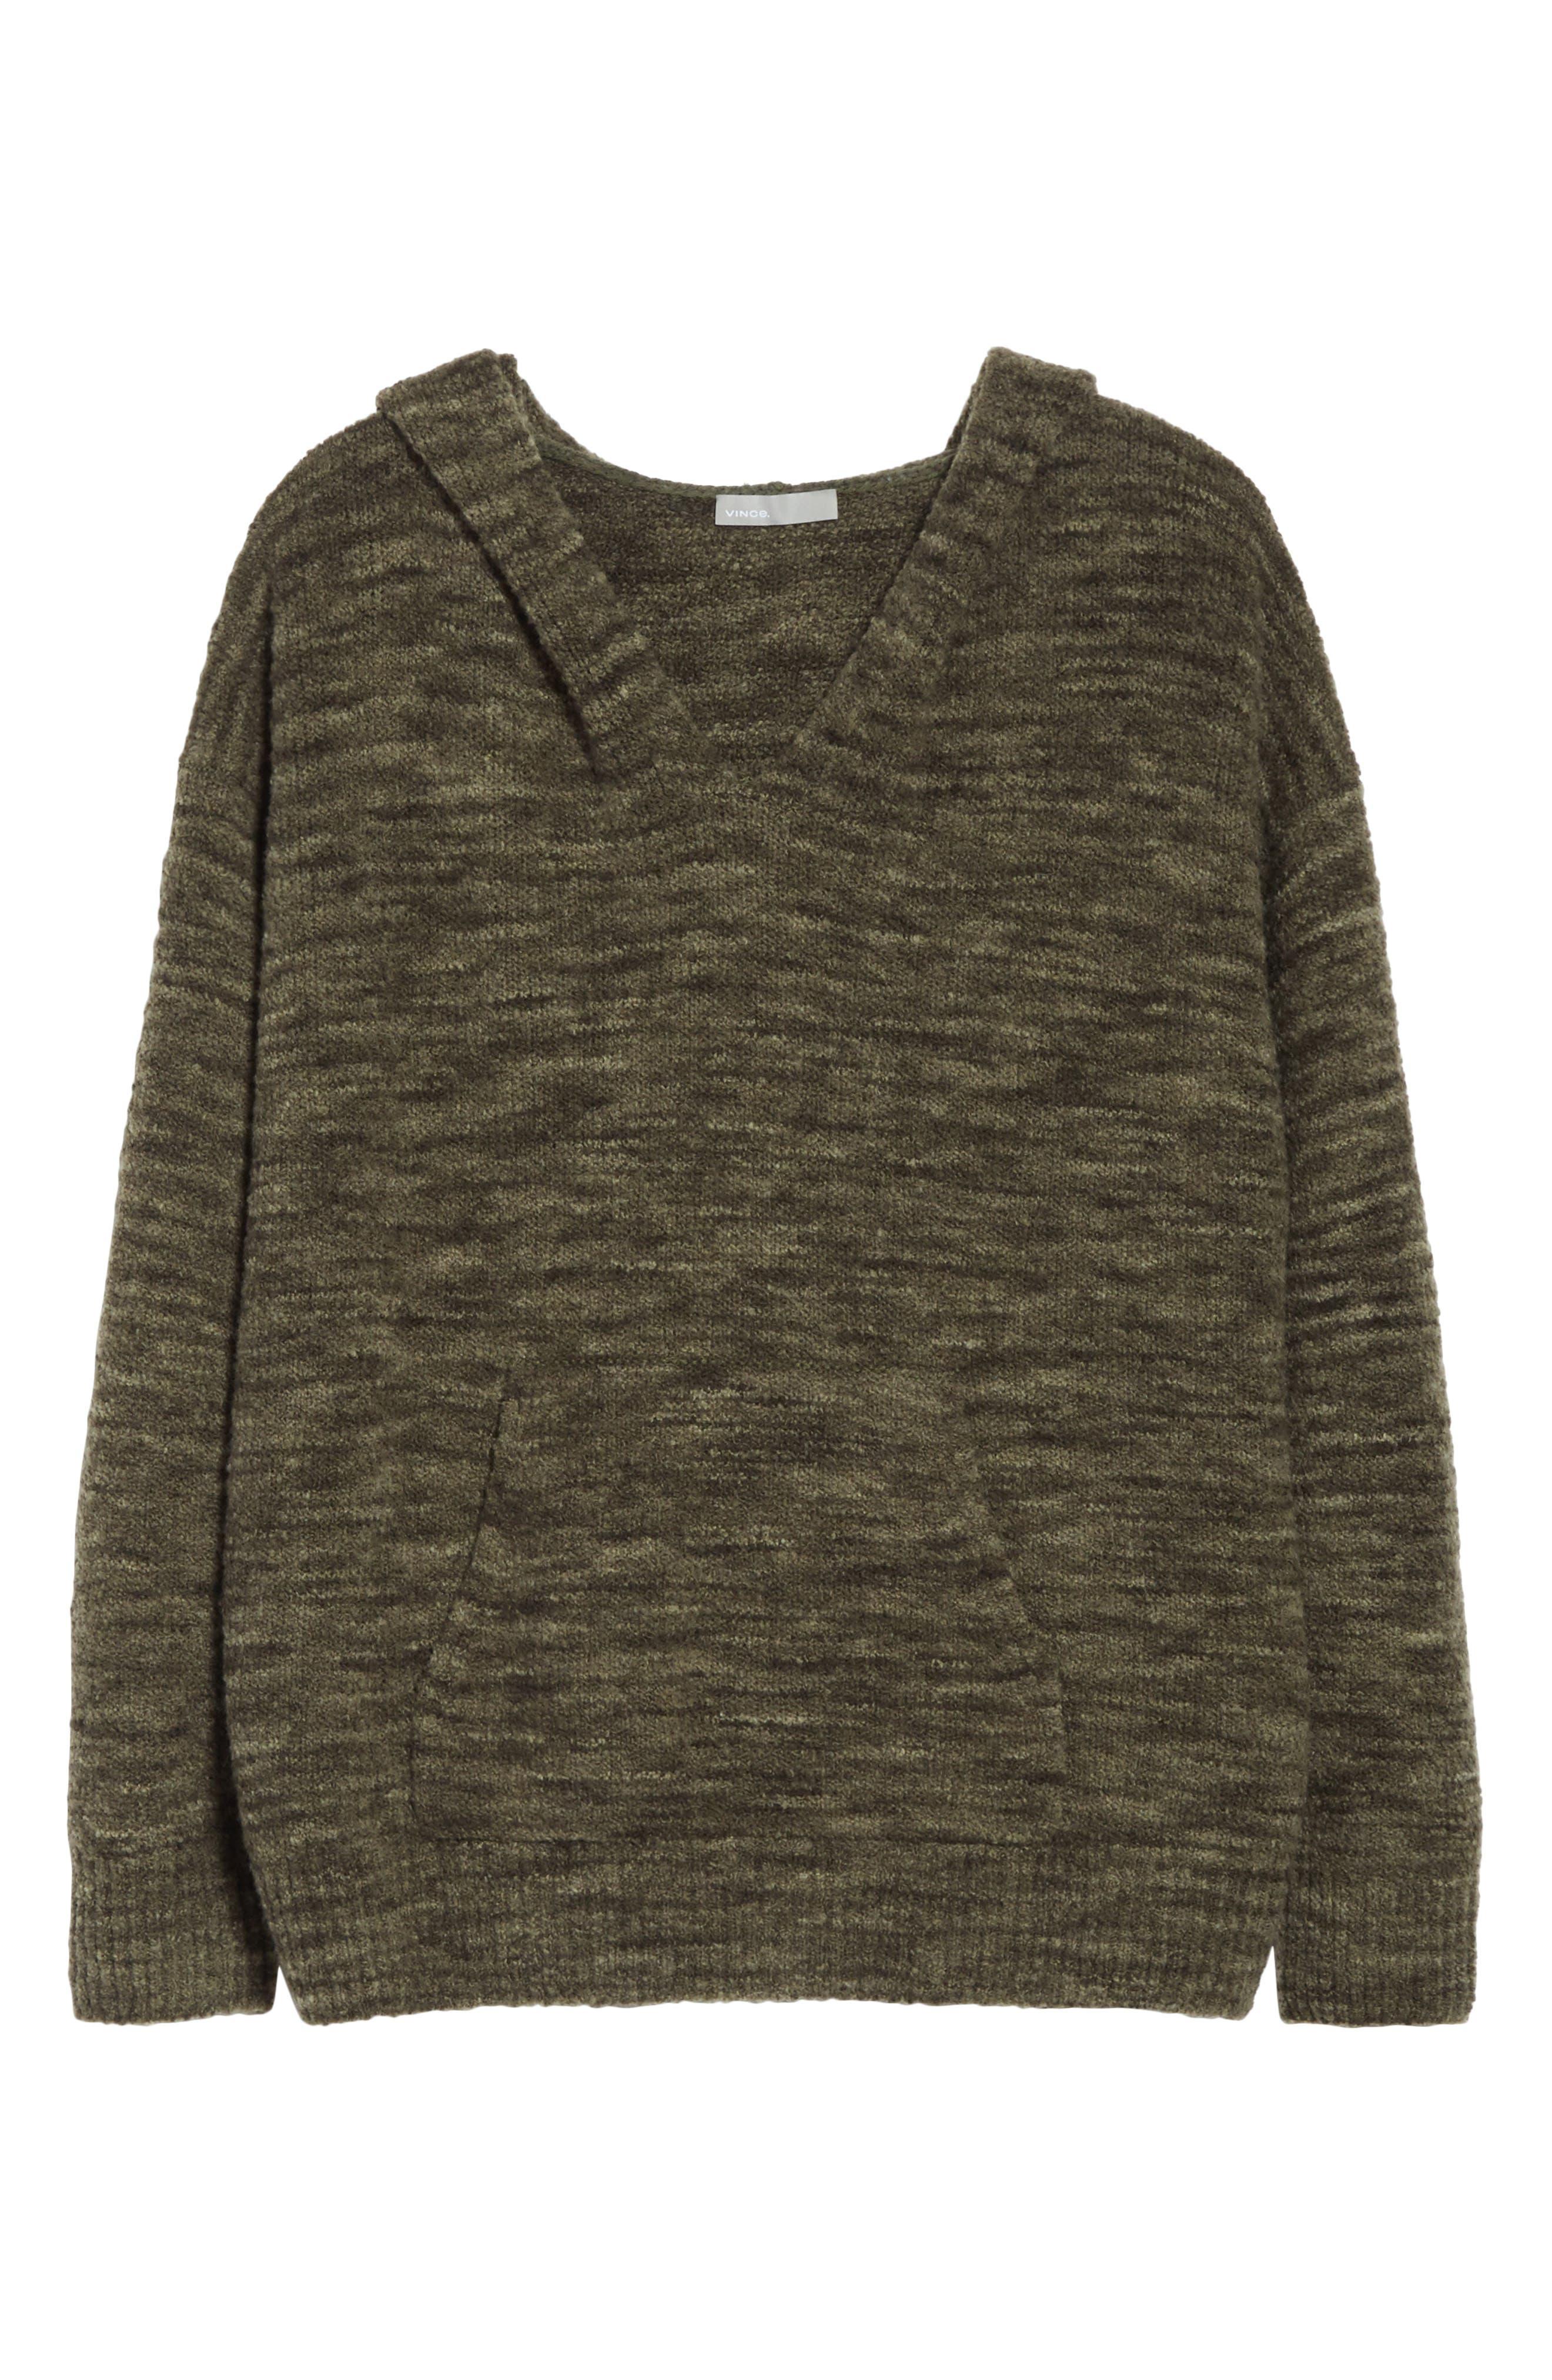 Space Dye Hoodie Sweater,                             Alternate thumbnail 6, color,                             343